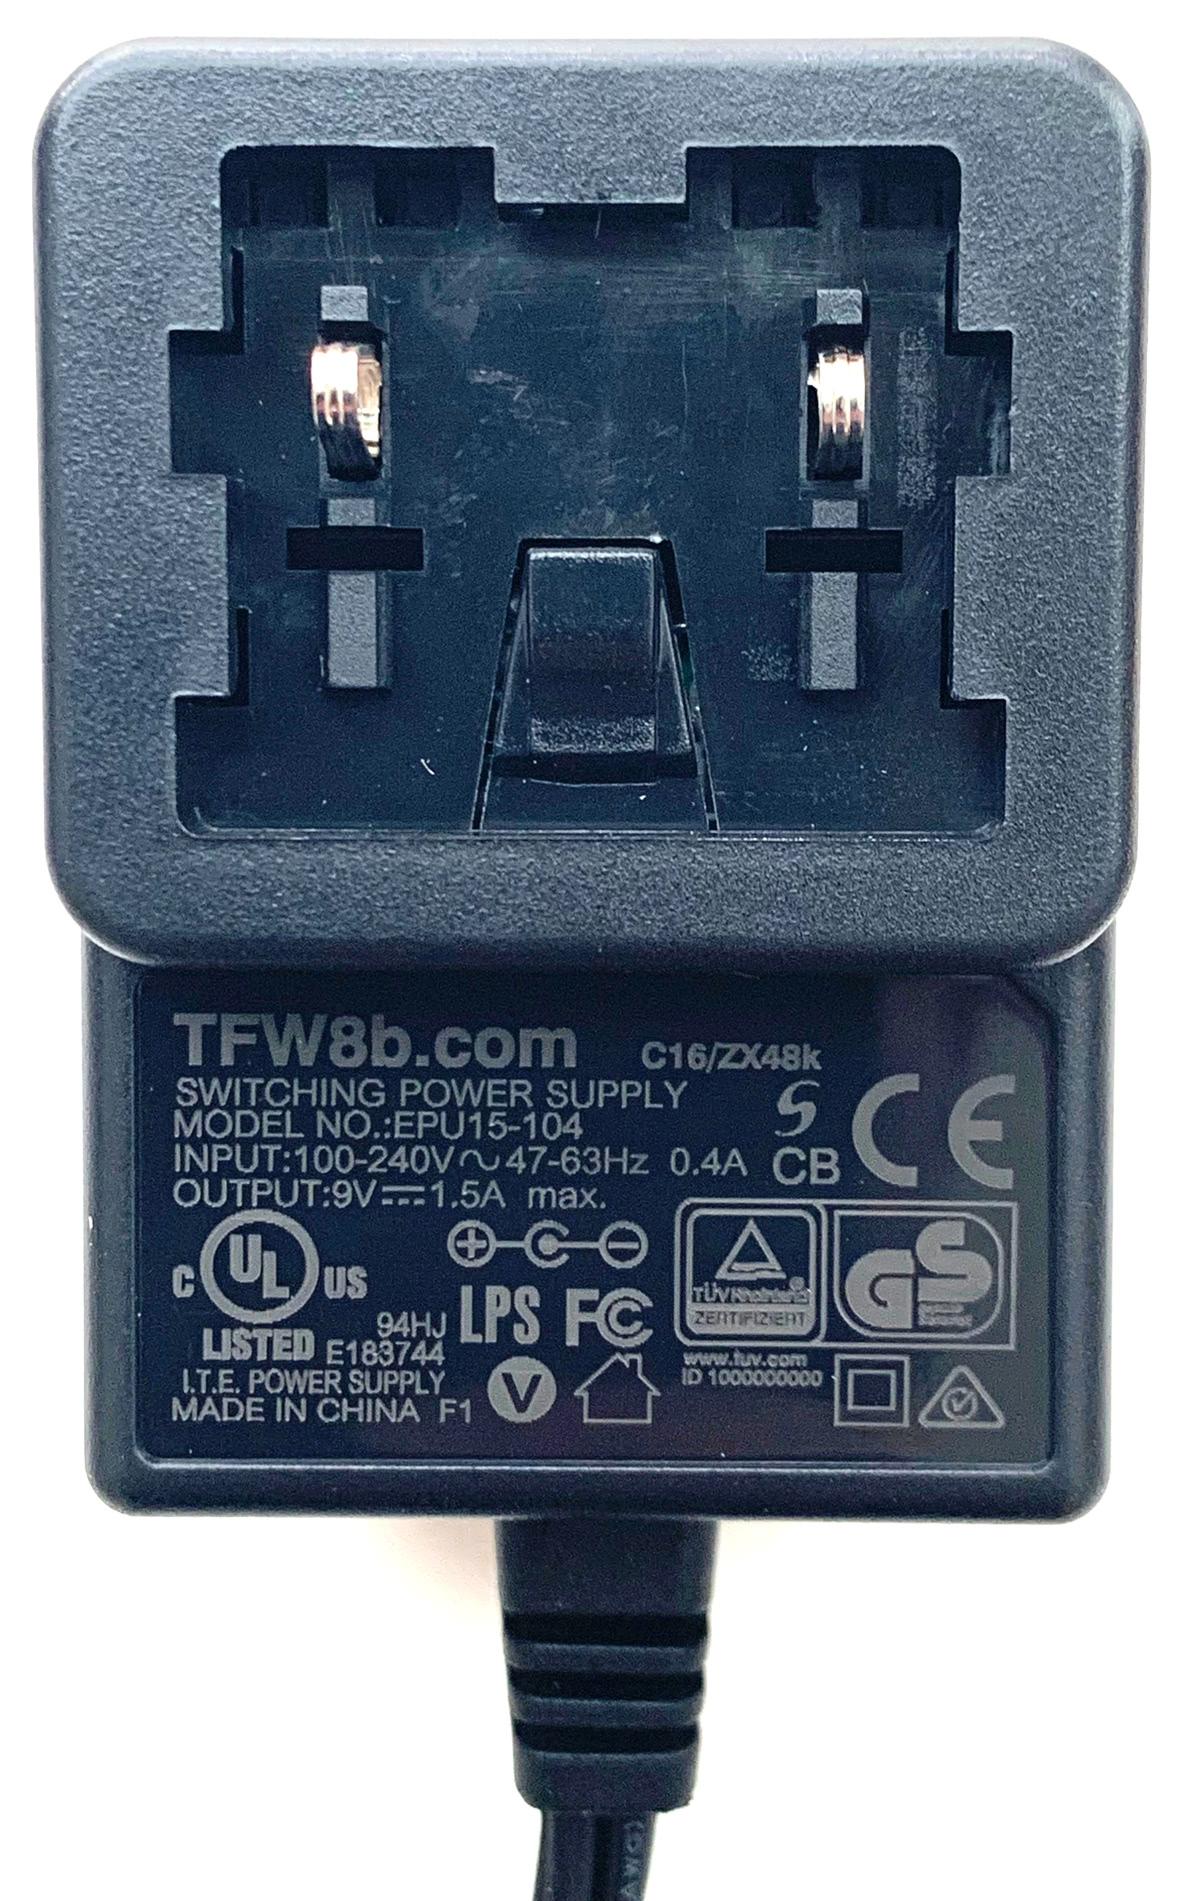 E5C0 Durable Universal Pc Audio Adapter External Sound Card USB Sound Card